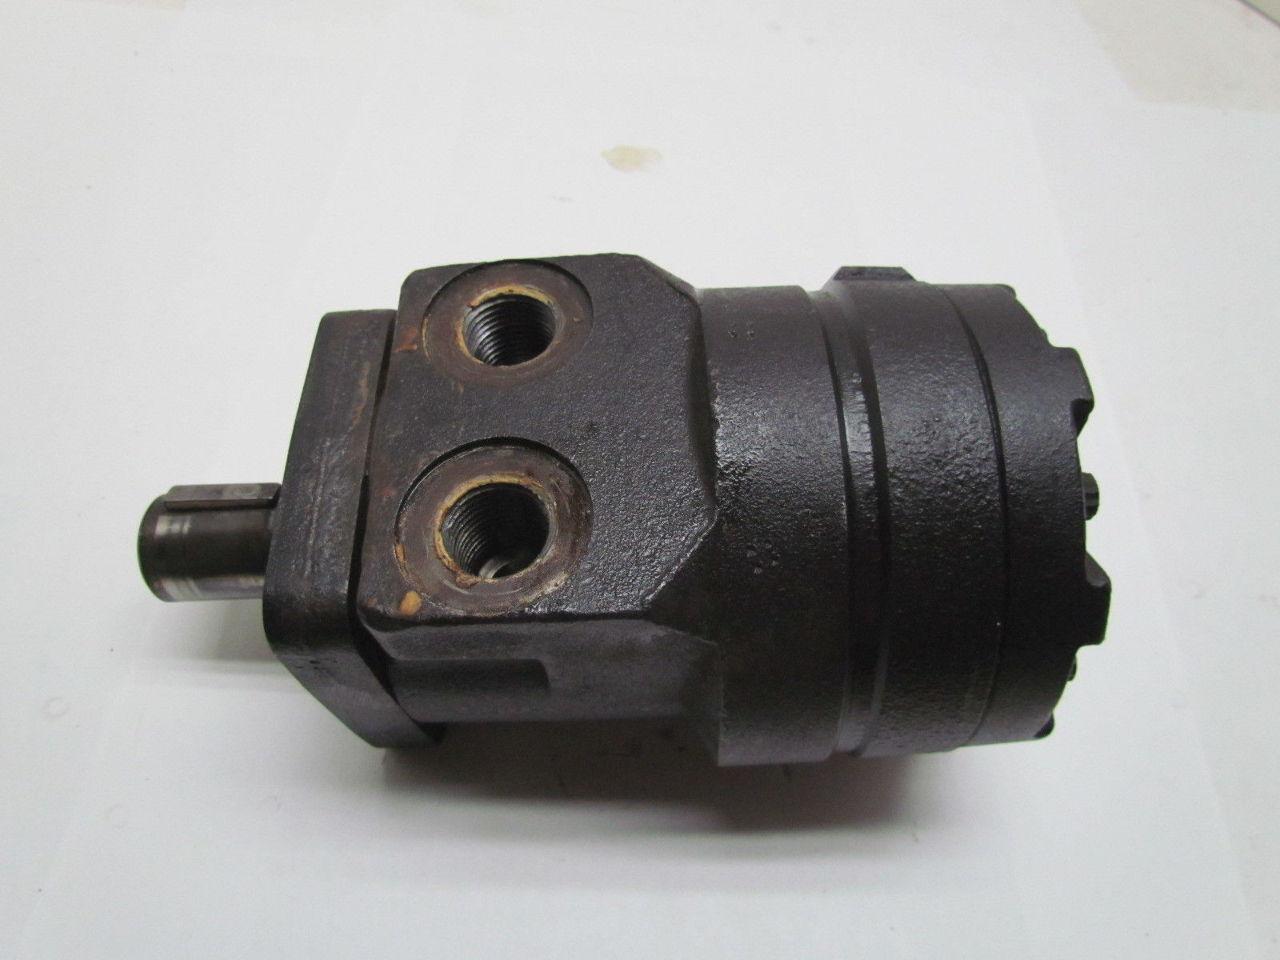 Eaton char lynn 103 1404 010 hydraulic motor 1 straight Eaton motor